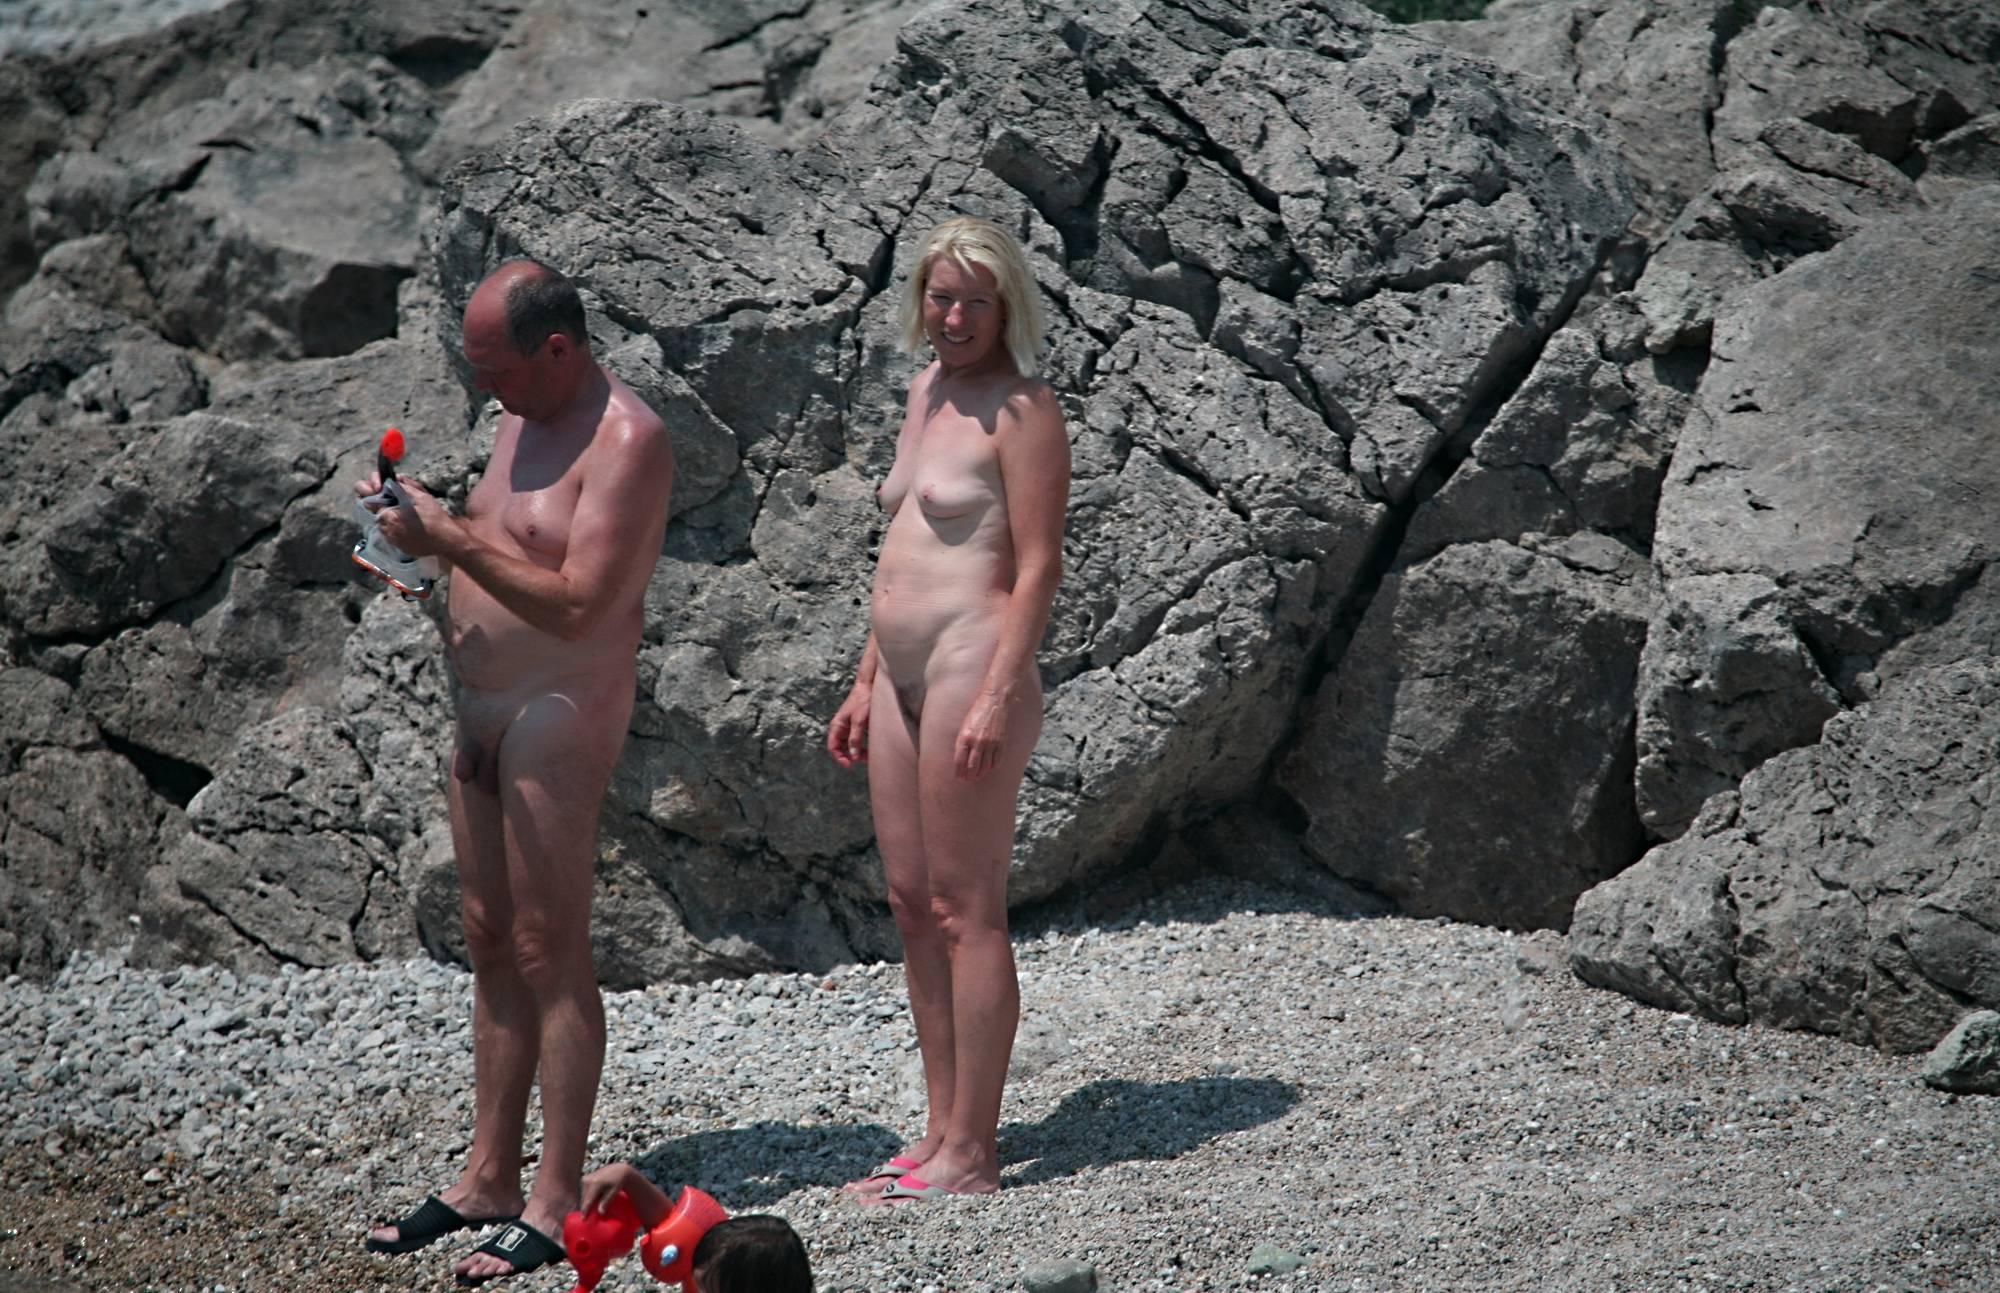 Purenudism Pics Nudist Family Shore Camp - 1